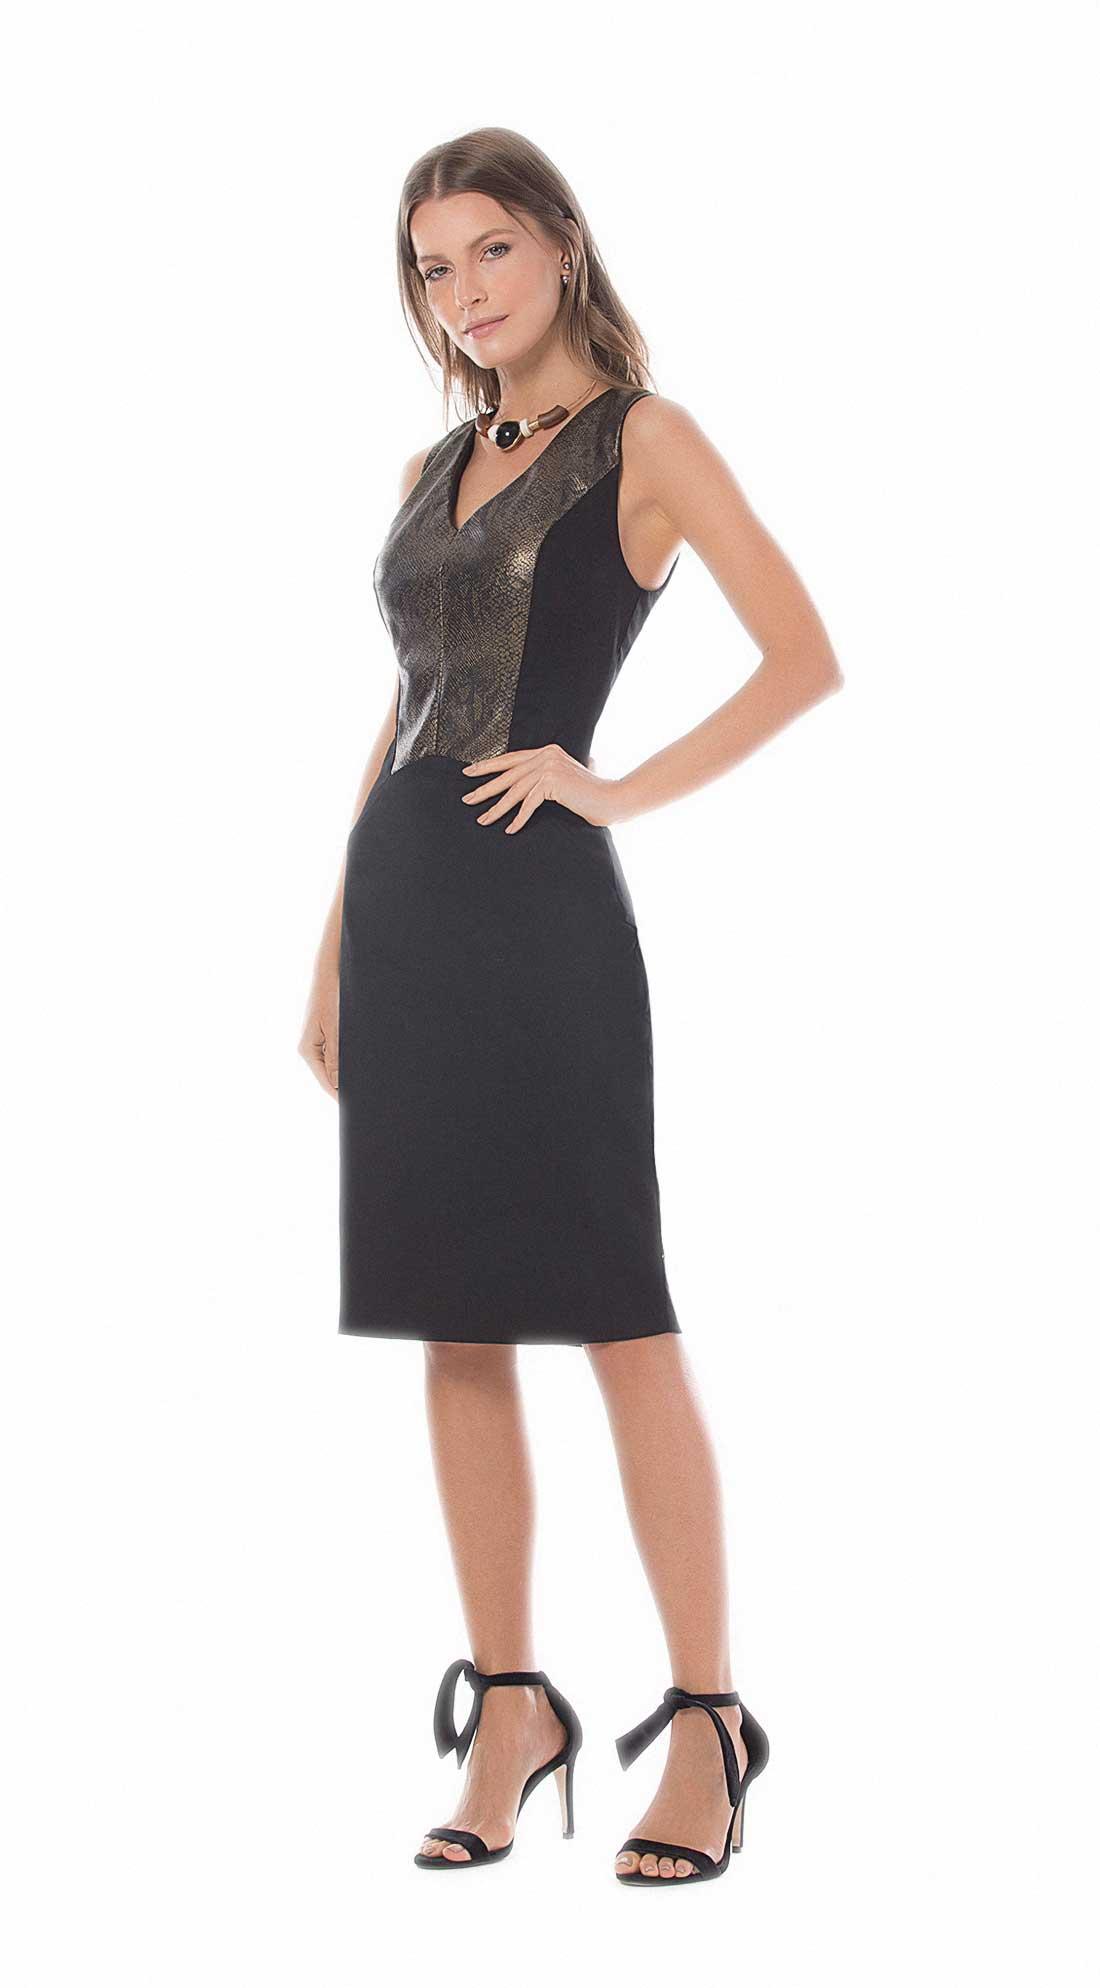 699ac0a991 Vestido Curto Decote V Recorte Bustos Preto - Maria Valentina